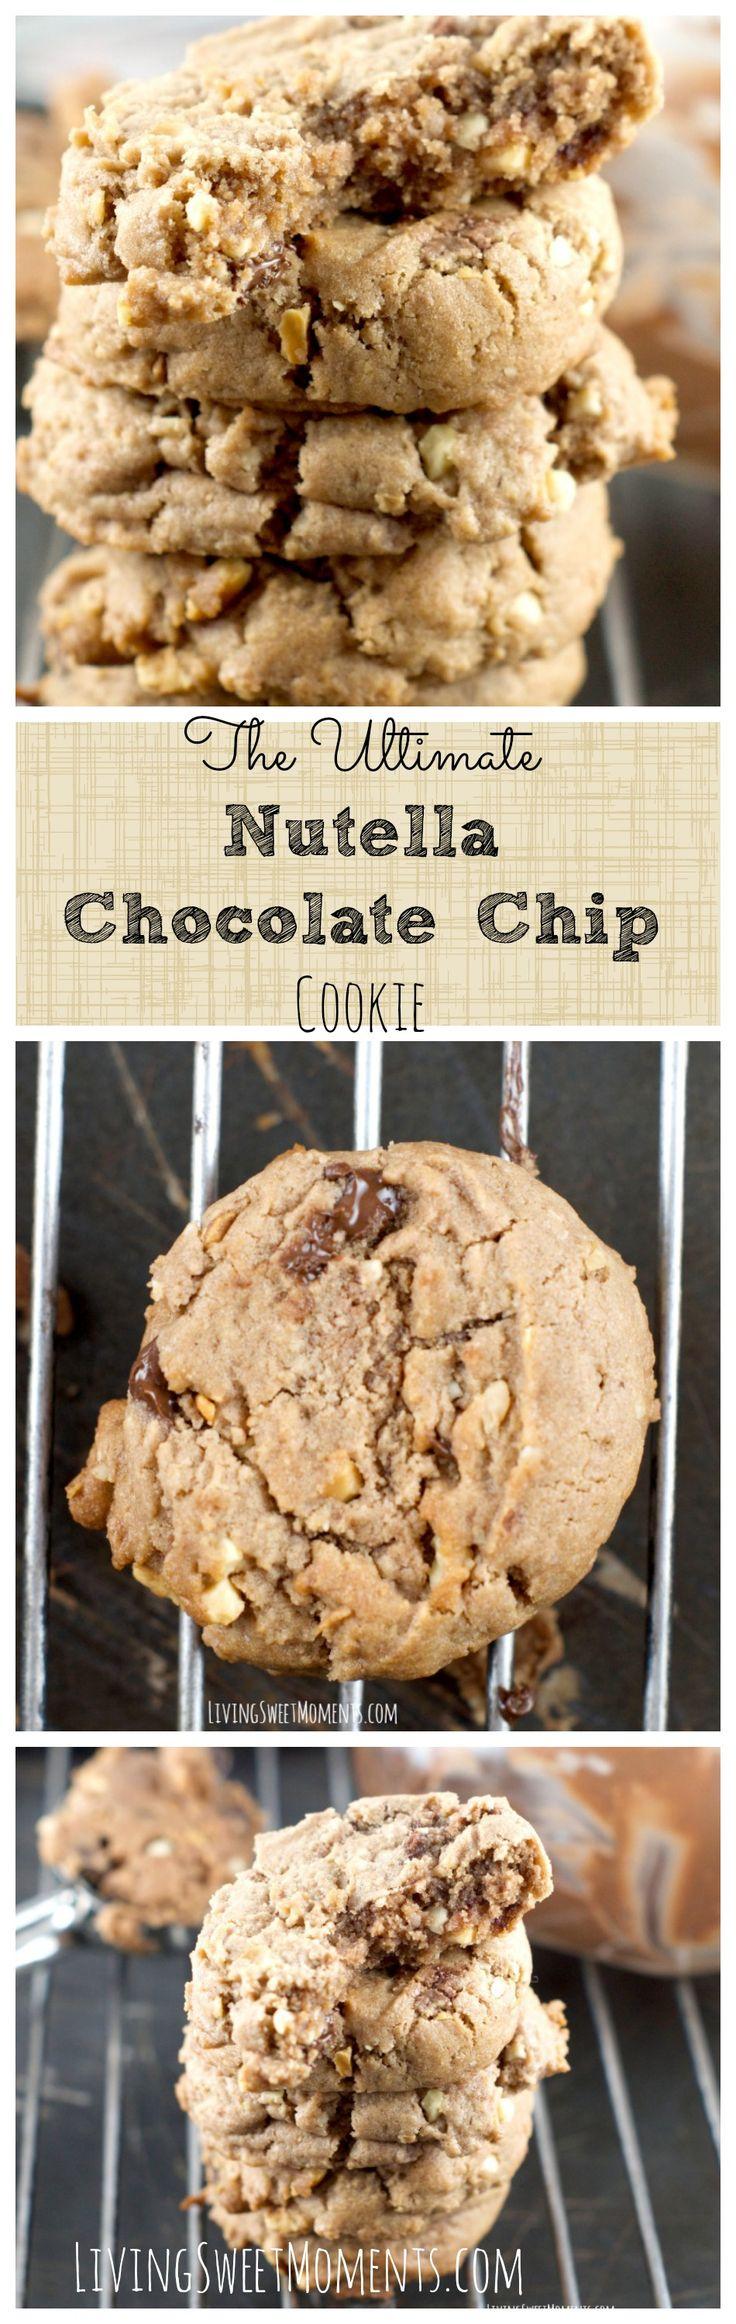 Best 10+ Nutella chocolate chip cookies ideas on Pinterest ...